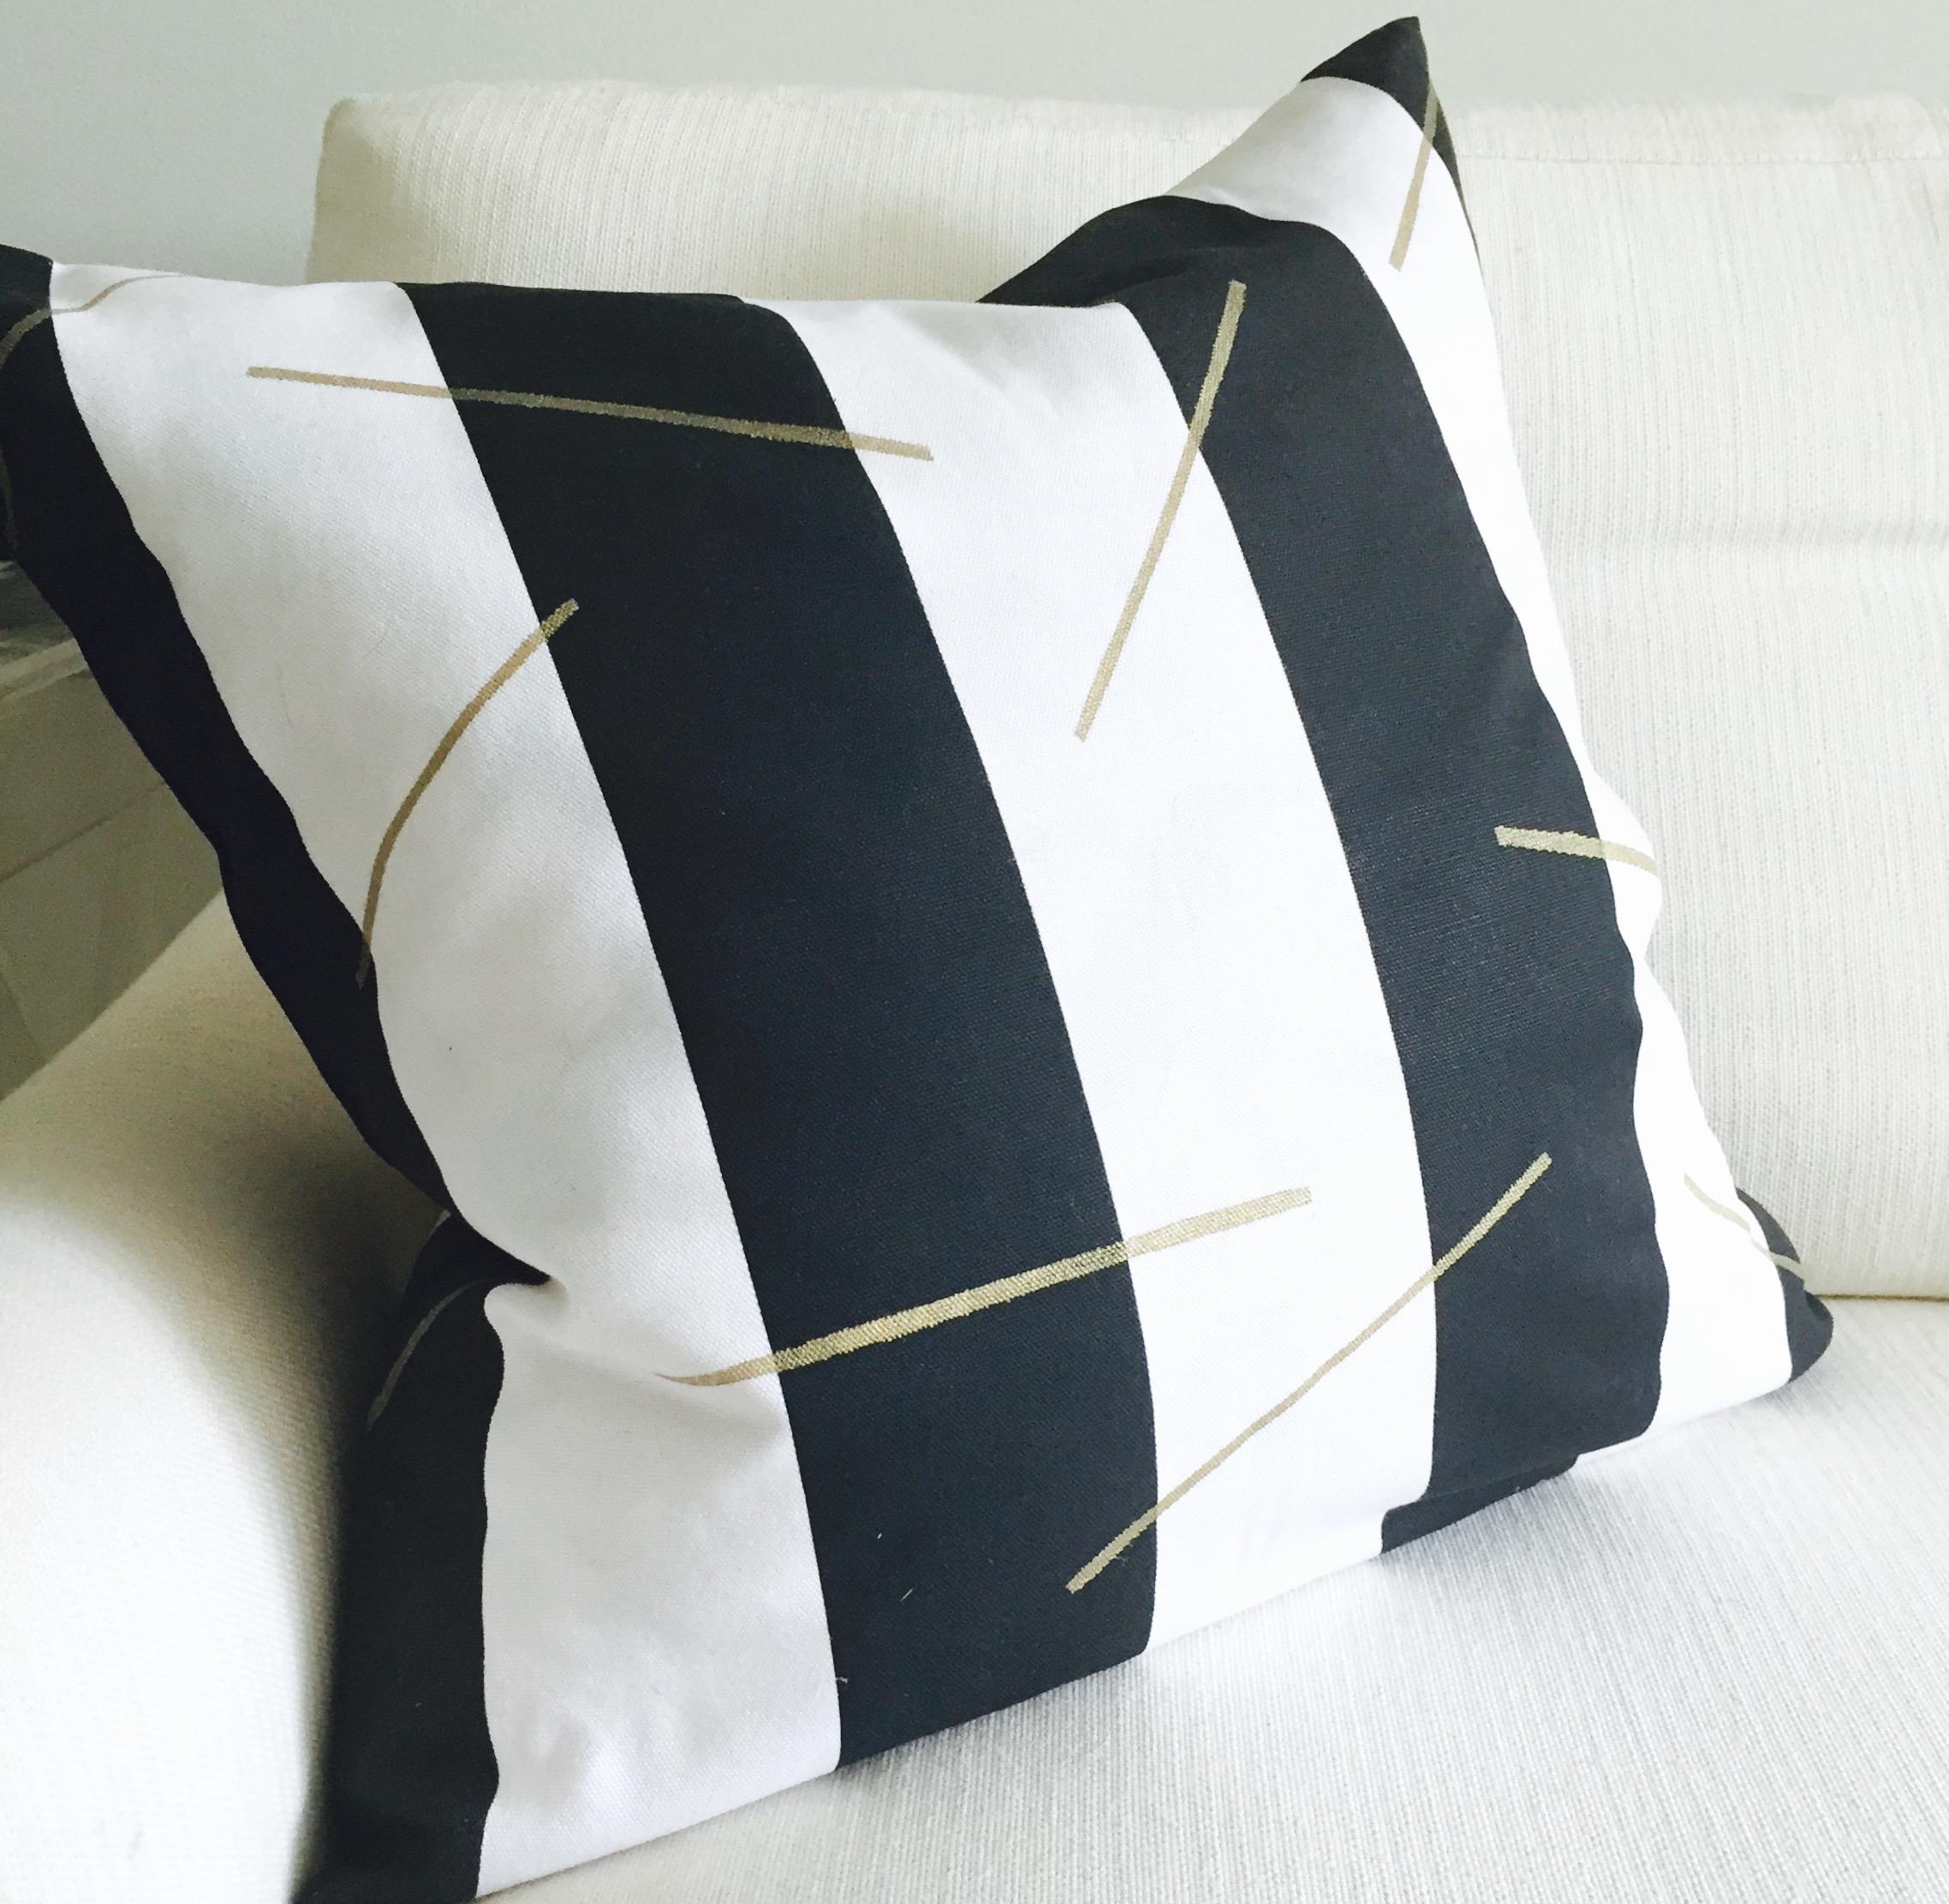 Ikea hack Vargyllen gold paint